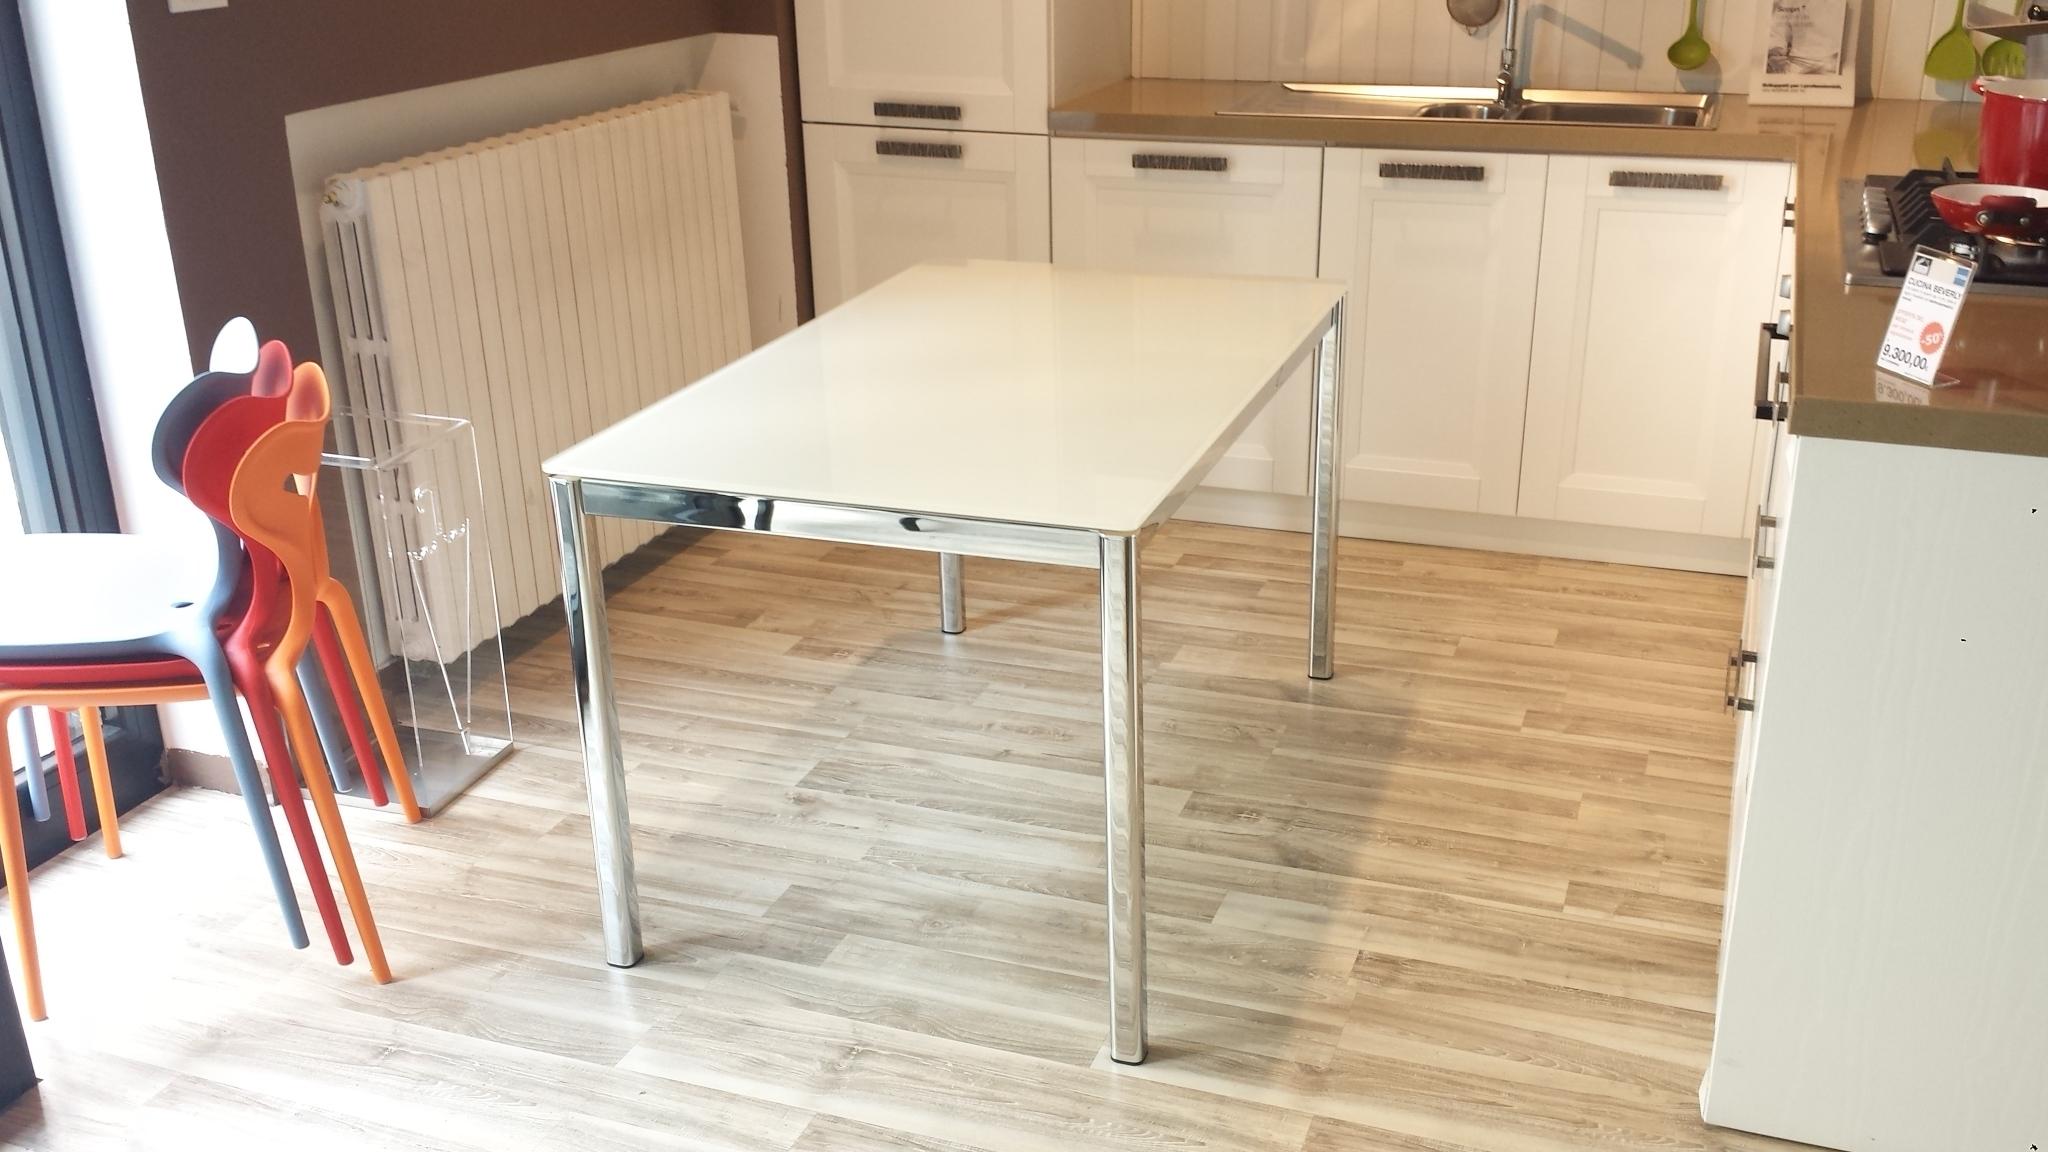 Tavolo da cucina allungabile performance 19660 tavoli a - Ikea tavoli da cucina allungabili ...